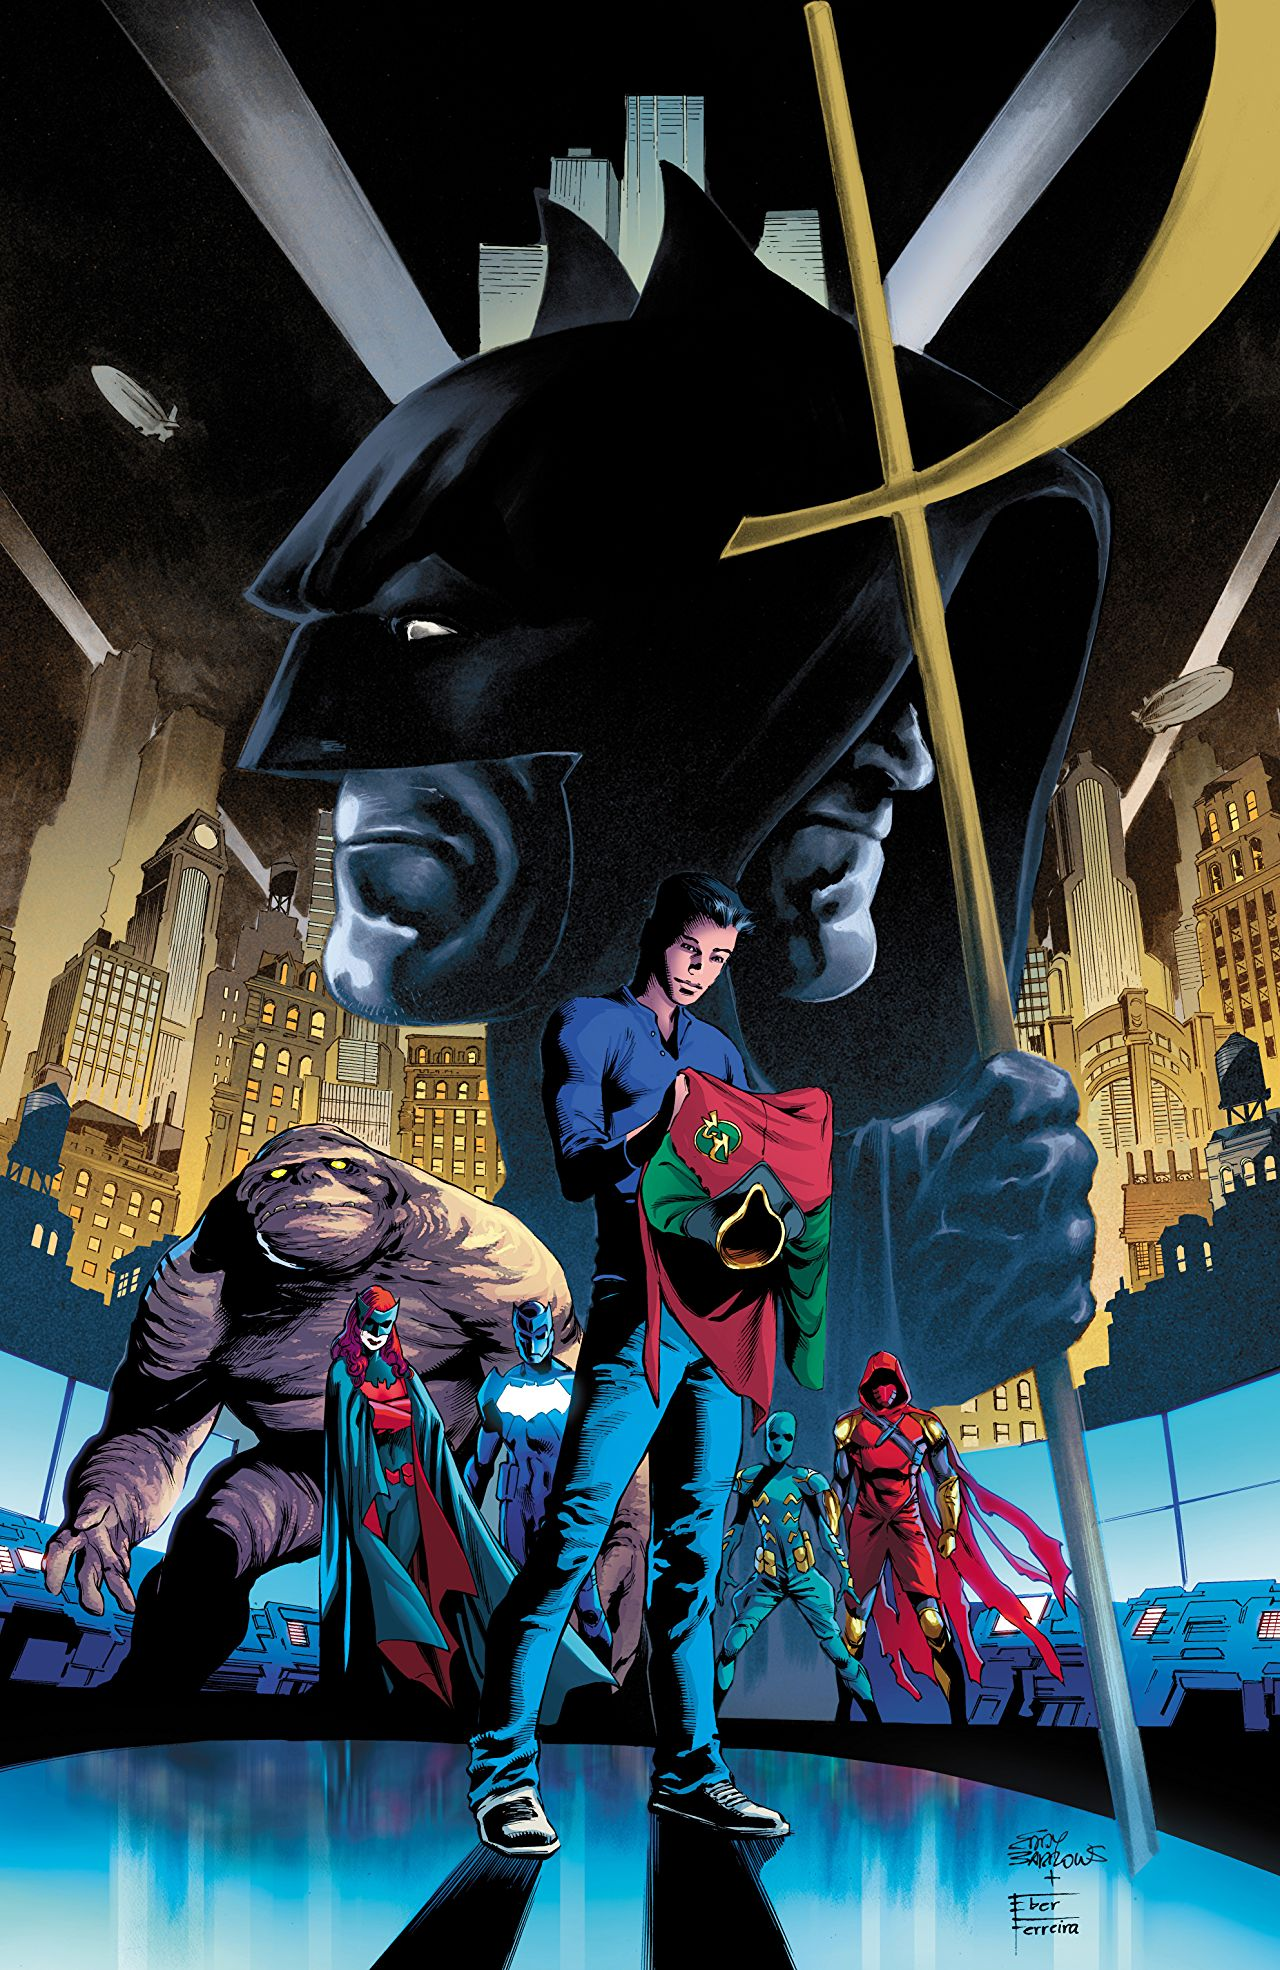 Tim Drake (center) on the cover of Detective Comics #965, DC Comics (2017).